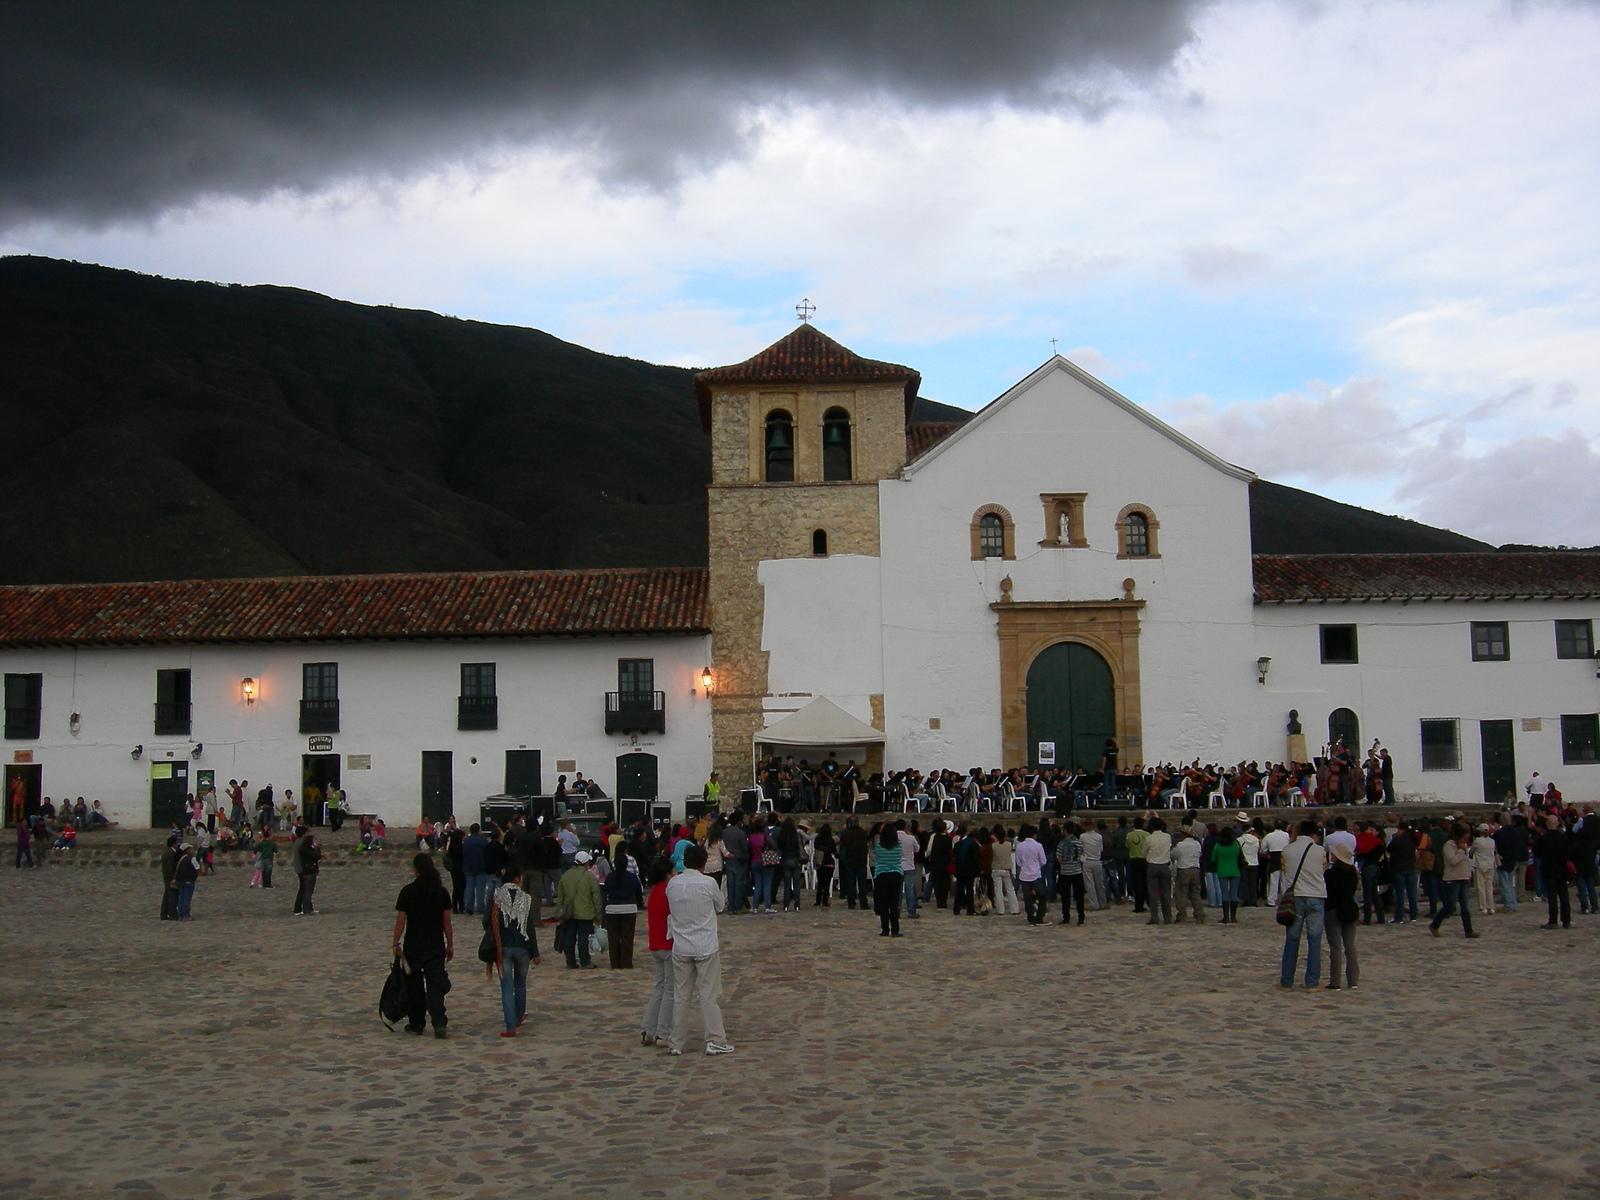 2013-10-02-colombia5.jpg